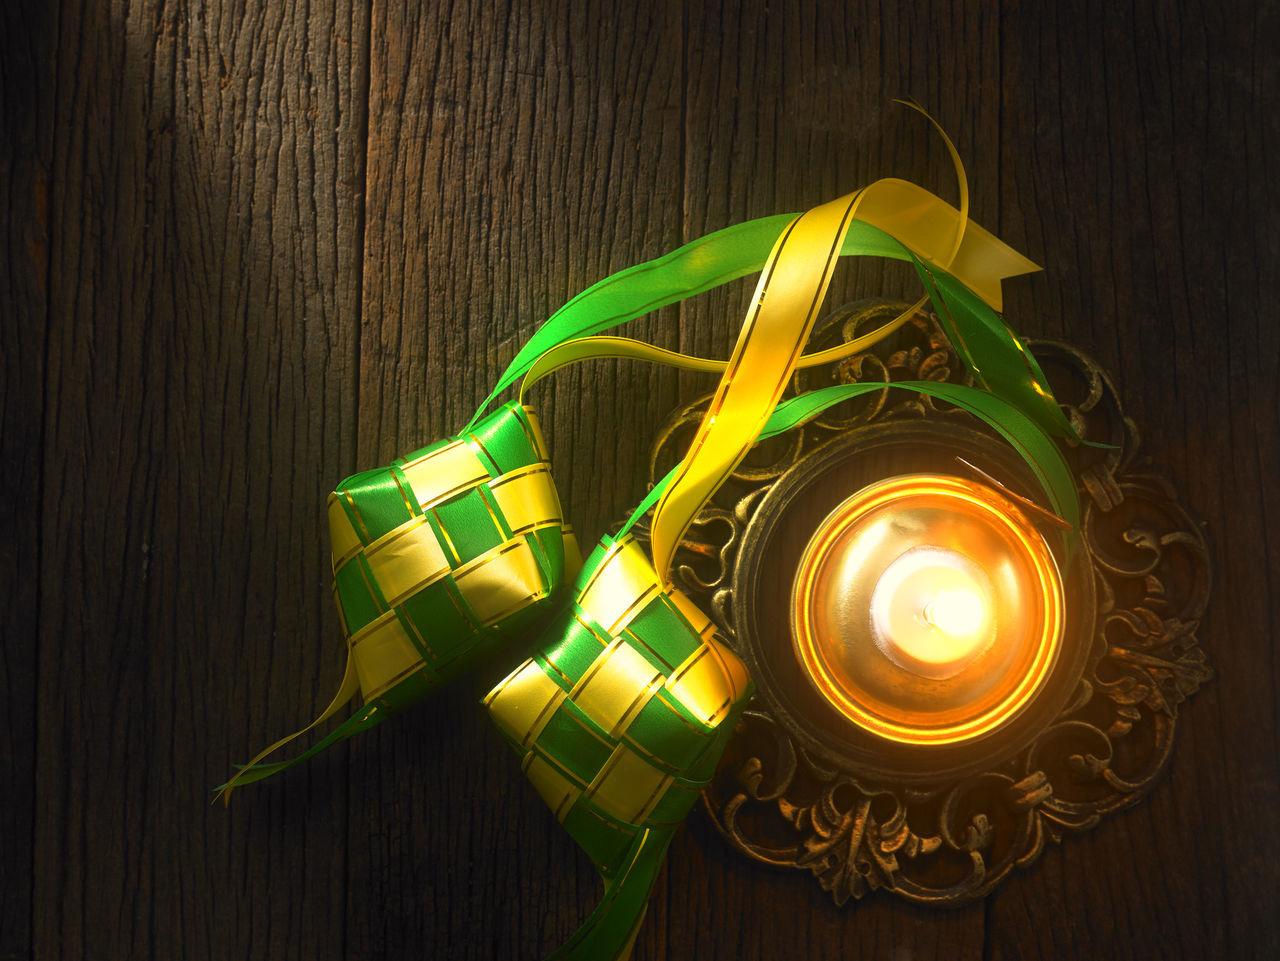 Aidilfitri Ambient Celebration Culture Culture And Tradition Decoration Eid Festival Festival Season Glow Greeting Hari Raya Hari Raya Aidilfitri Illumination Islam Ketupat Oil Lamp Pelita Ramadan  Religion Spiritual